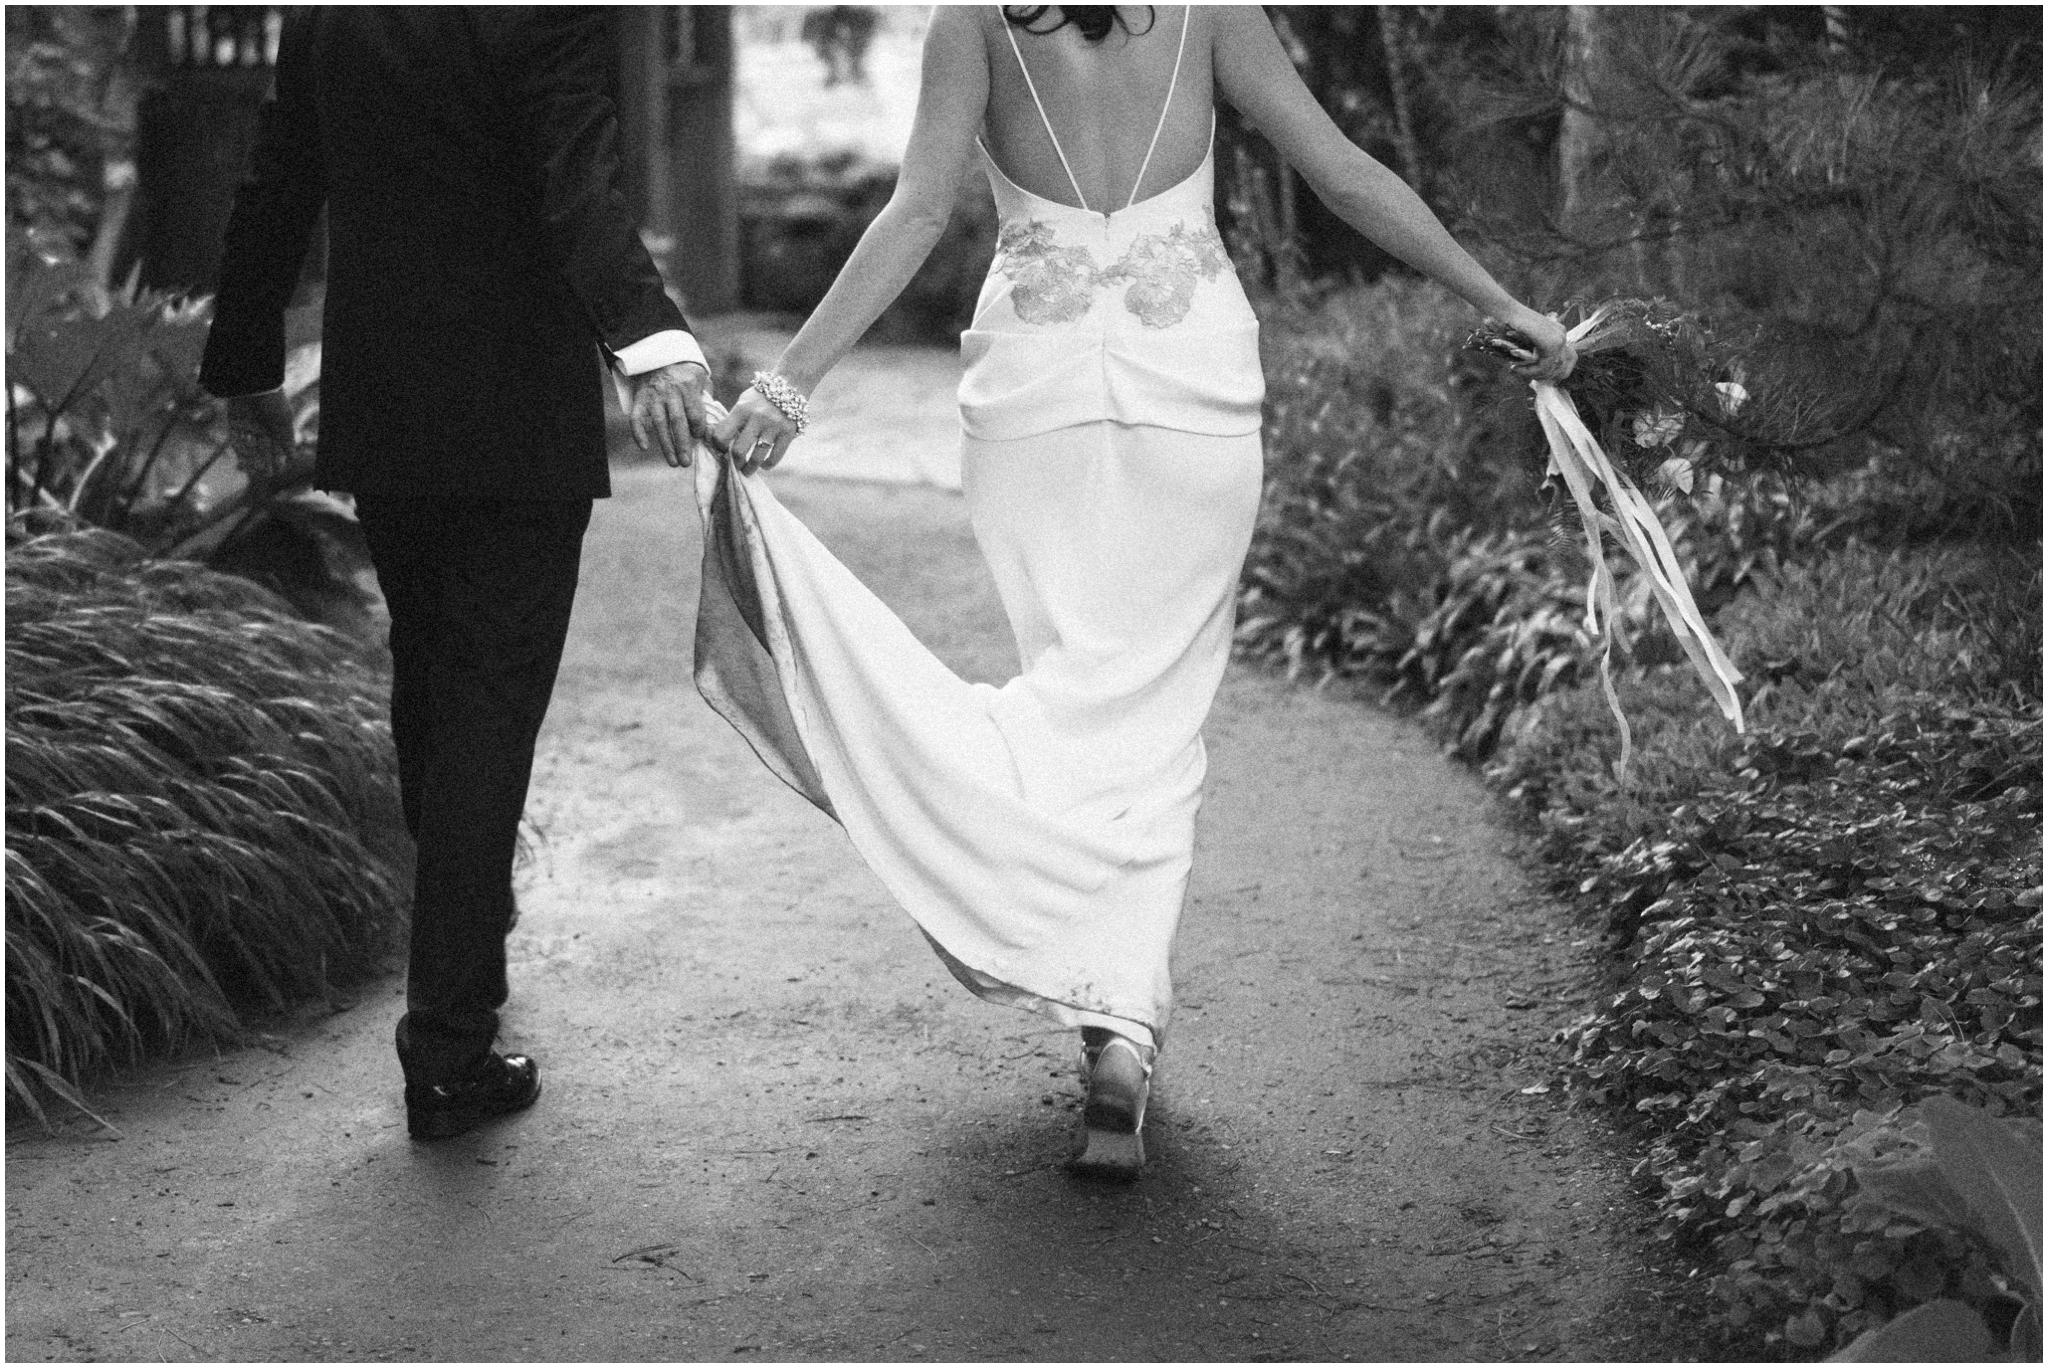 TJ-Romero-Photographer_Handcrafted-nostalgic-romantic-16.jpg